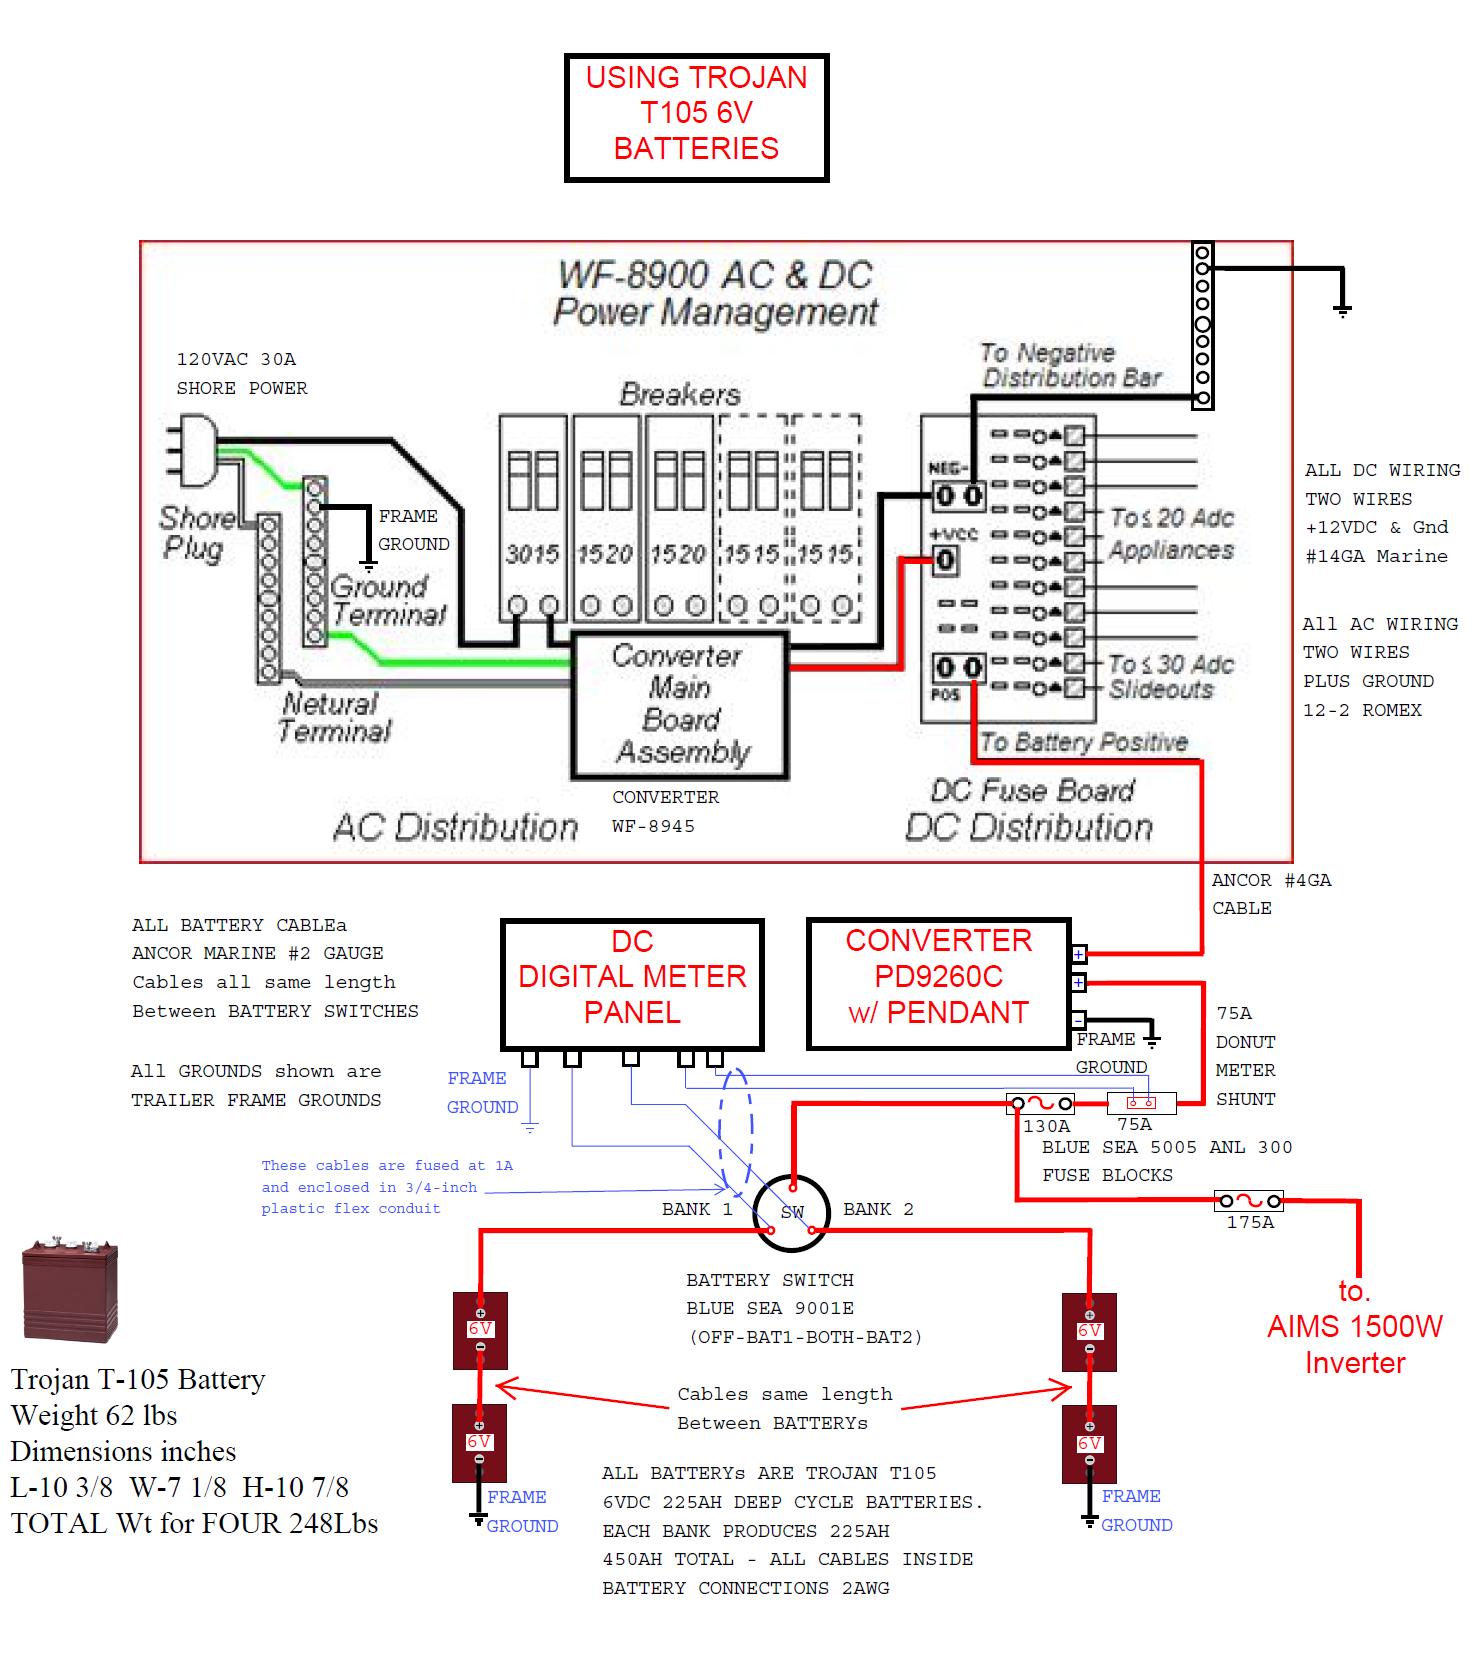 DIAGRAM] Wfco 8725 Wiring Diagram FULL Version HD Quality Wiring Diagram -  DIAGRAMCLOTHING.ROOFGARDENZACCARDI.IT   Springdale Rv Wiring Diagram      Diagram Database